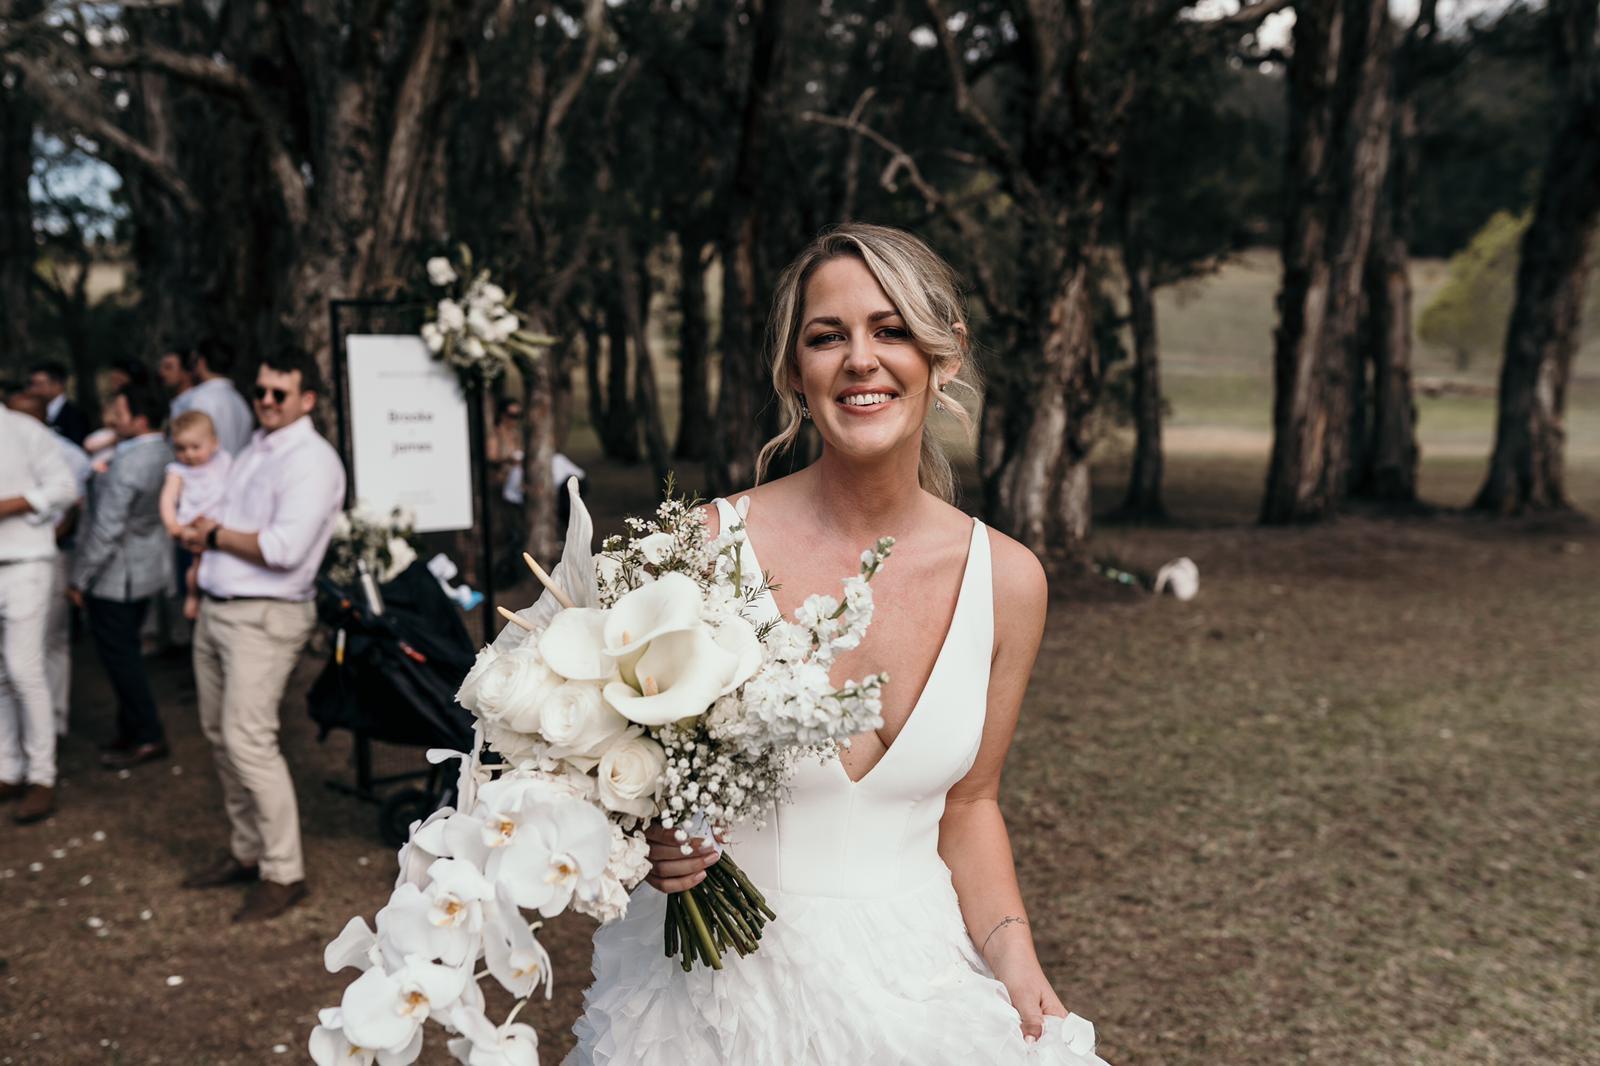 Bridal/ Wedding Service